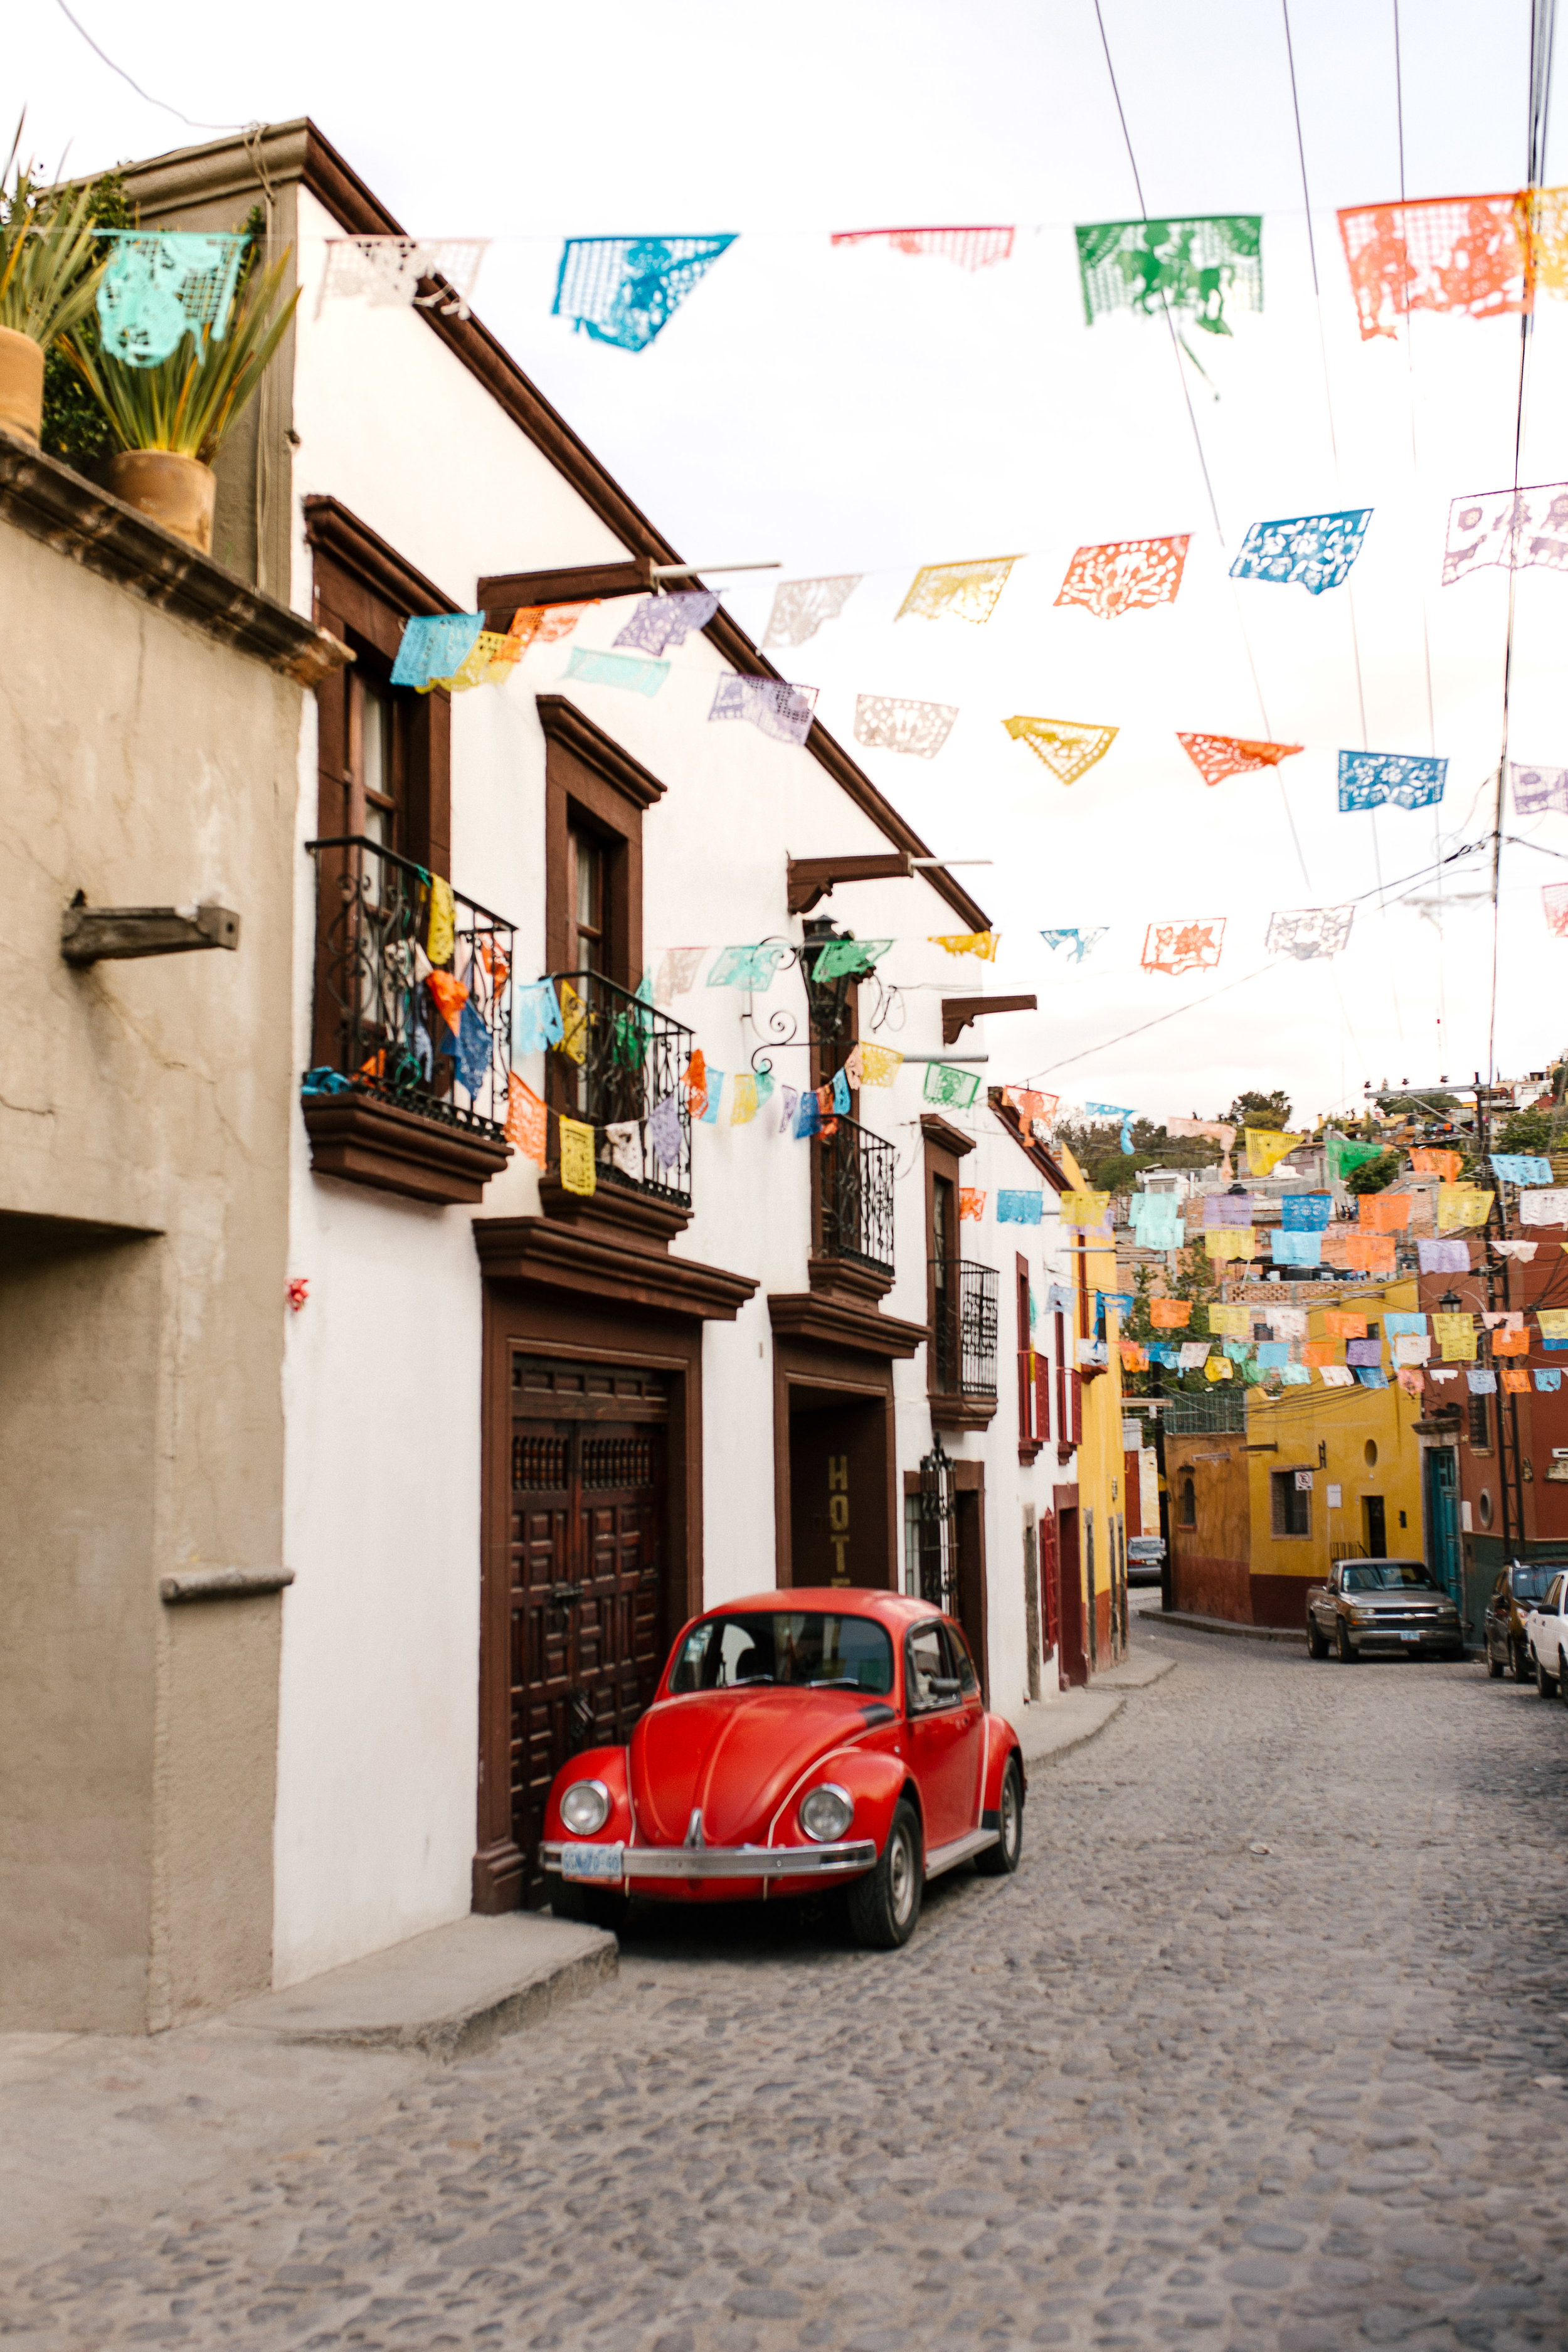 Travel Photos Chelsea Macor Photography San Miguel de Allende Mexico Seattle Photographer-20.jpg